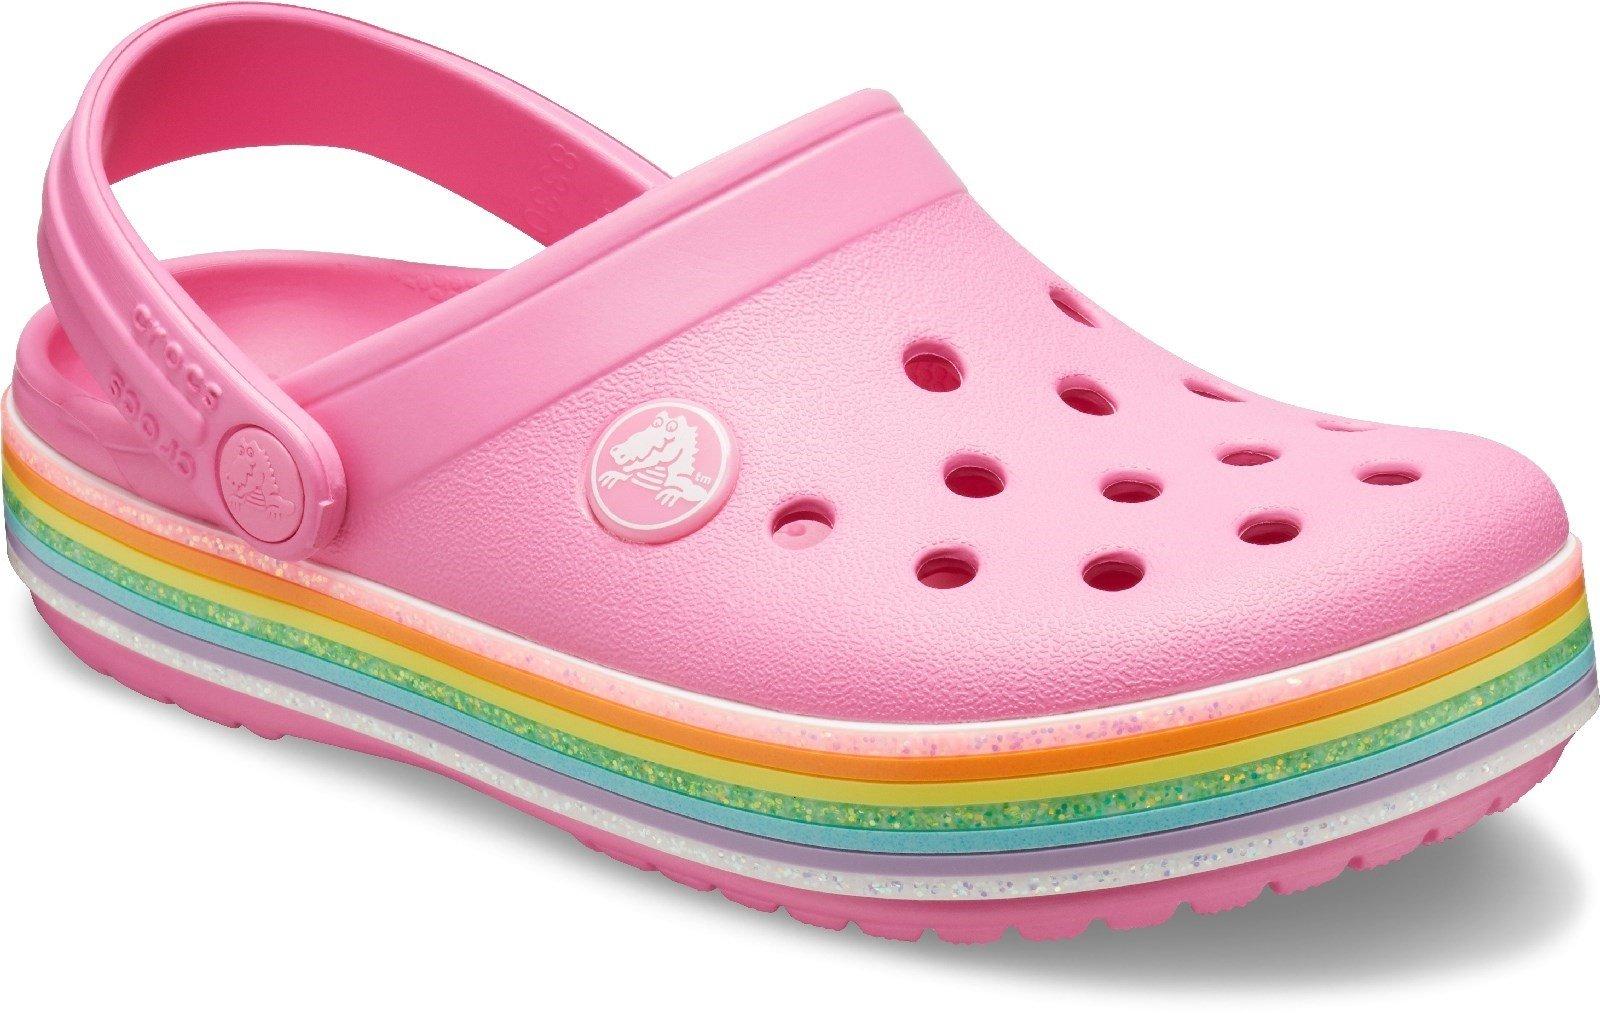 Crocs Kid's Rainbow Glitter Clog Various Colours 30711 - Pink Lemonade 4 UK